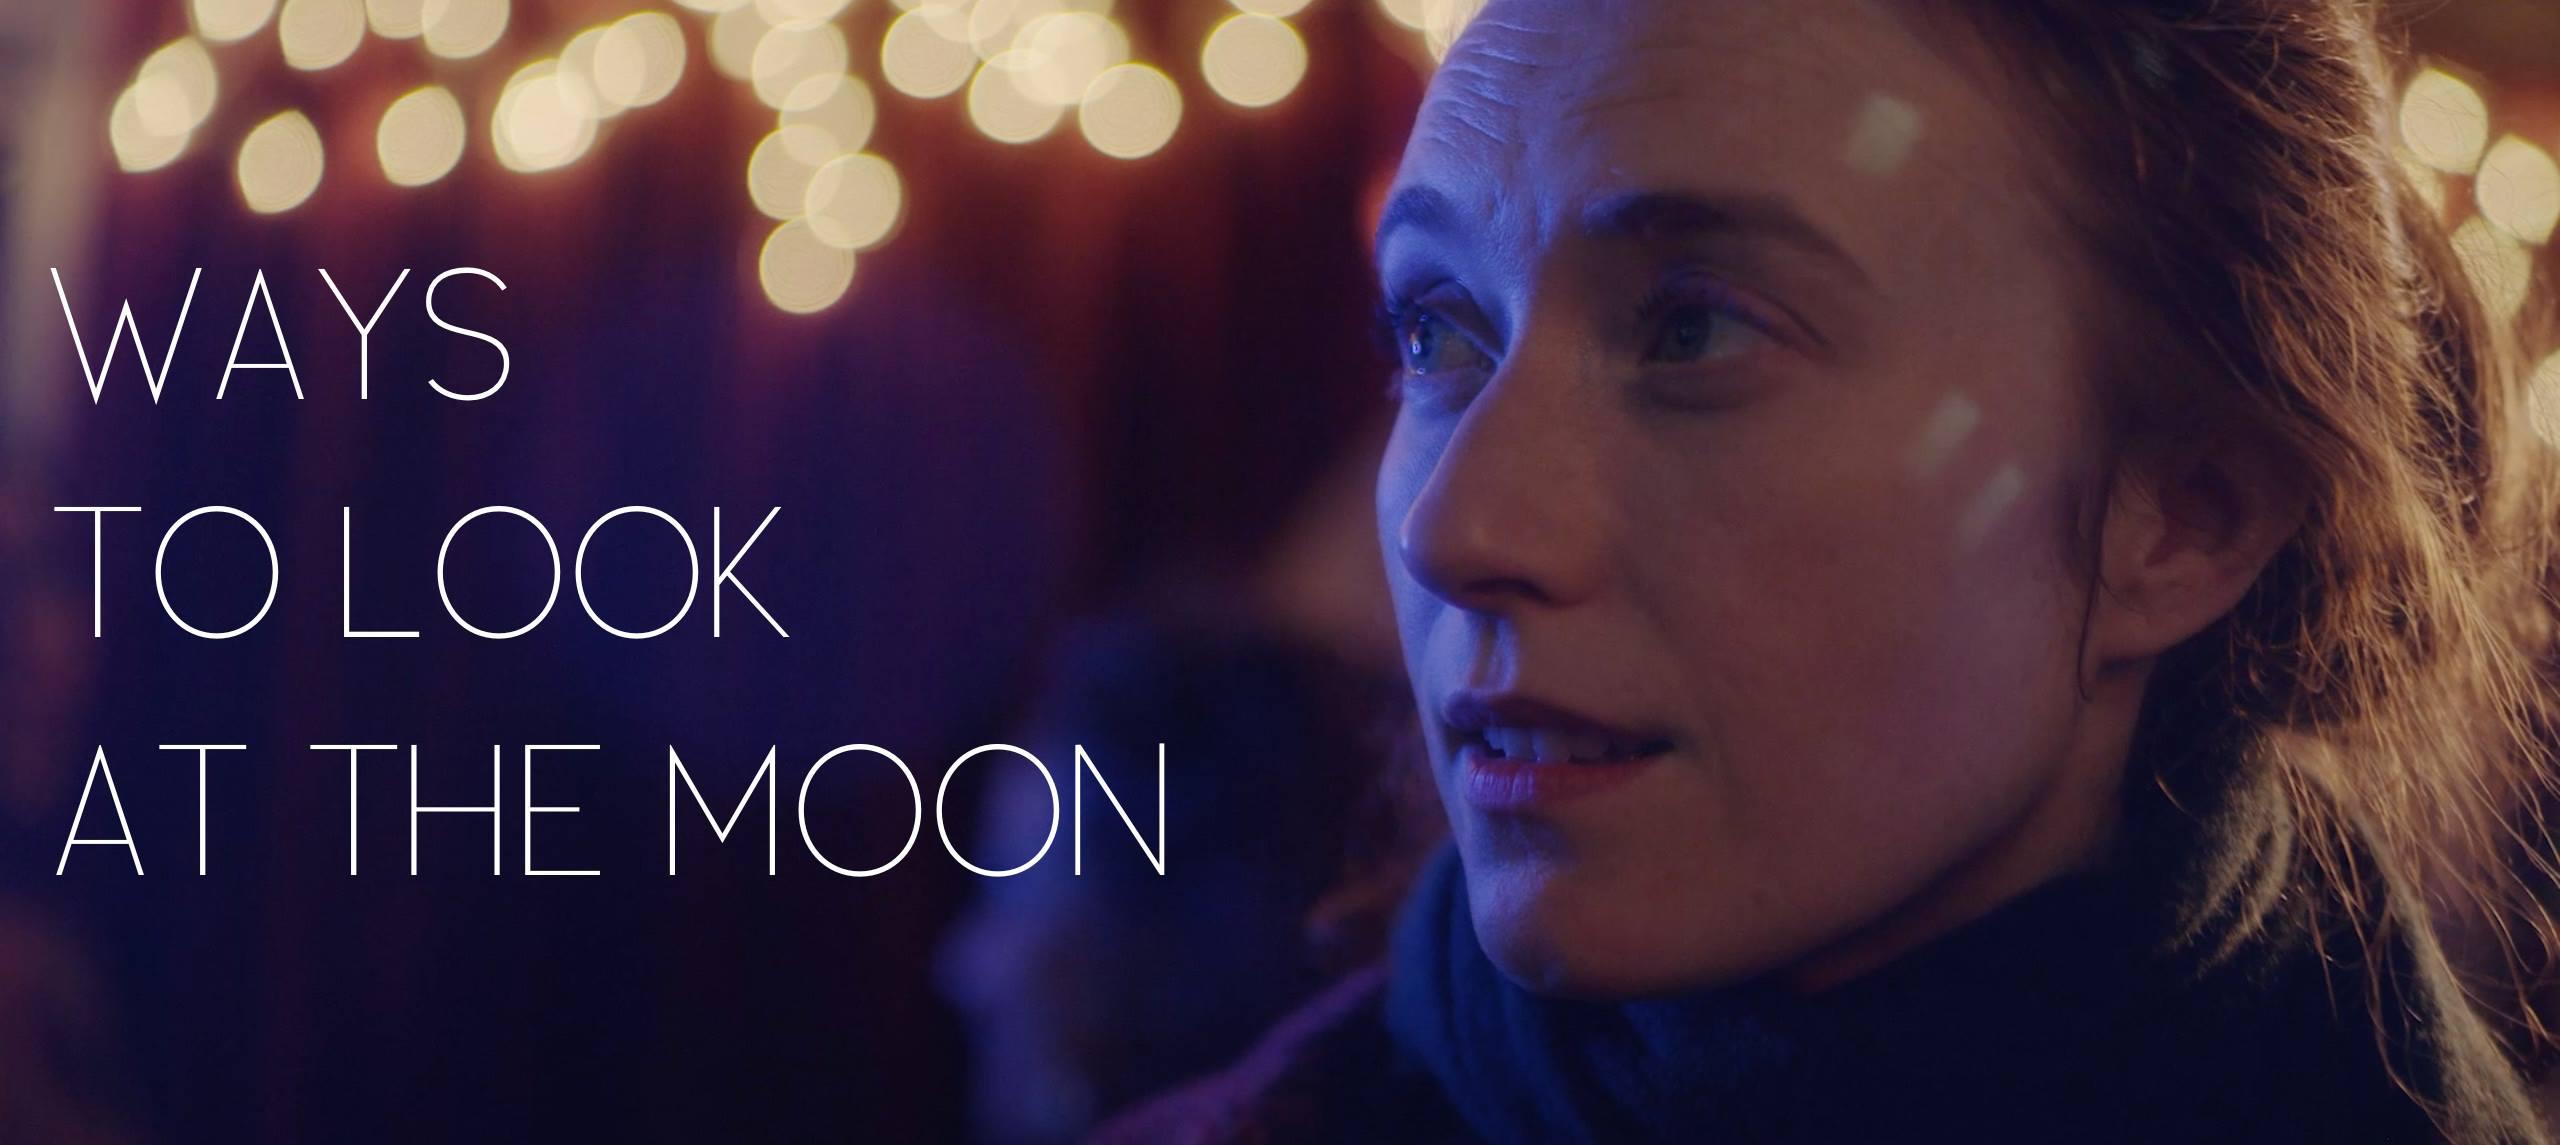 Amy Schumer Nua film nights | artworks trenton